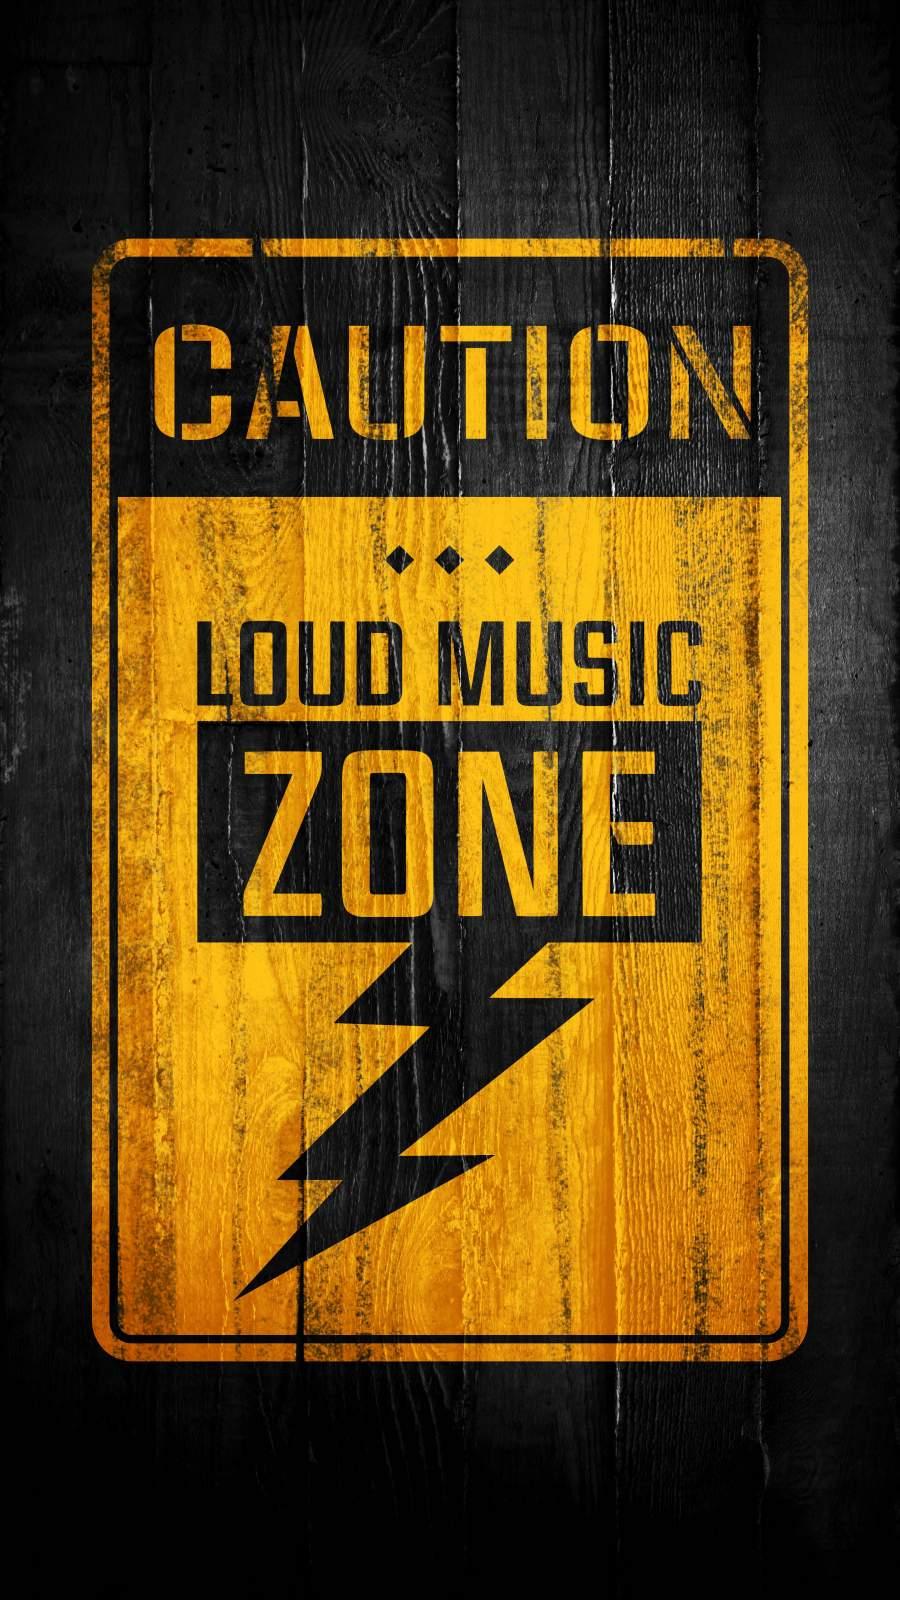 Caution Loud Music Zone